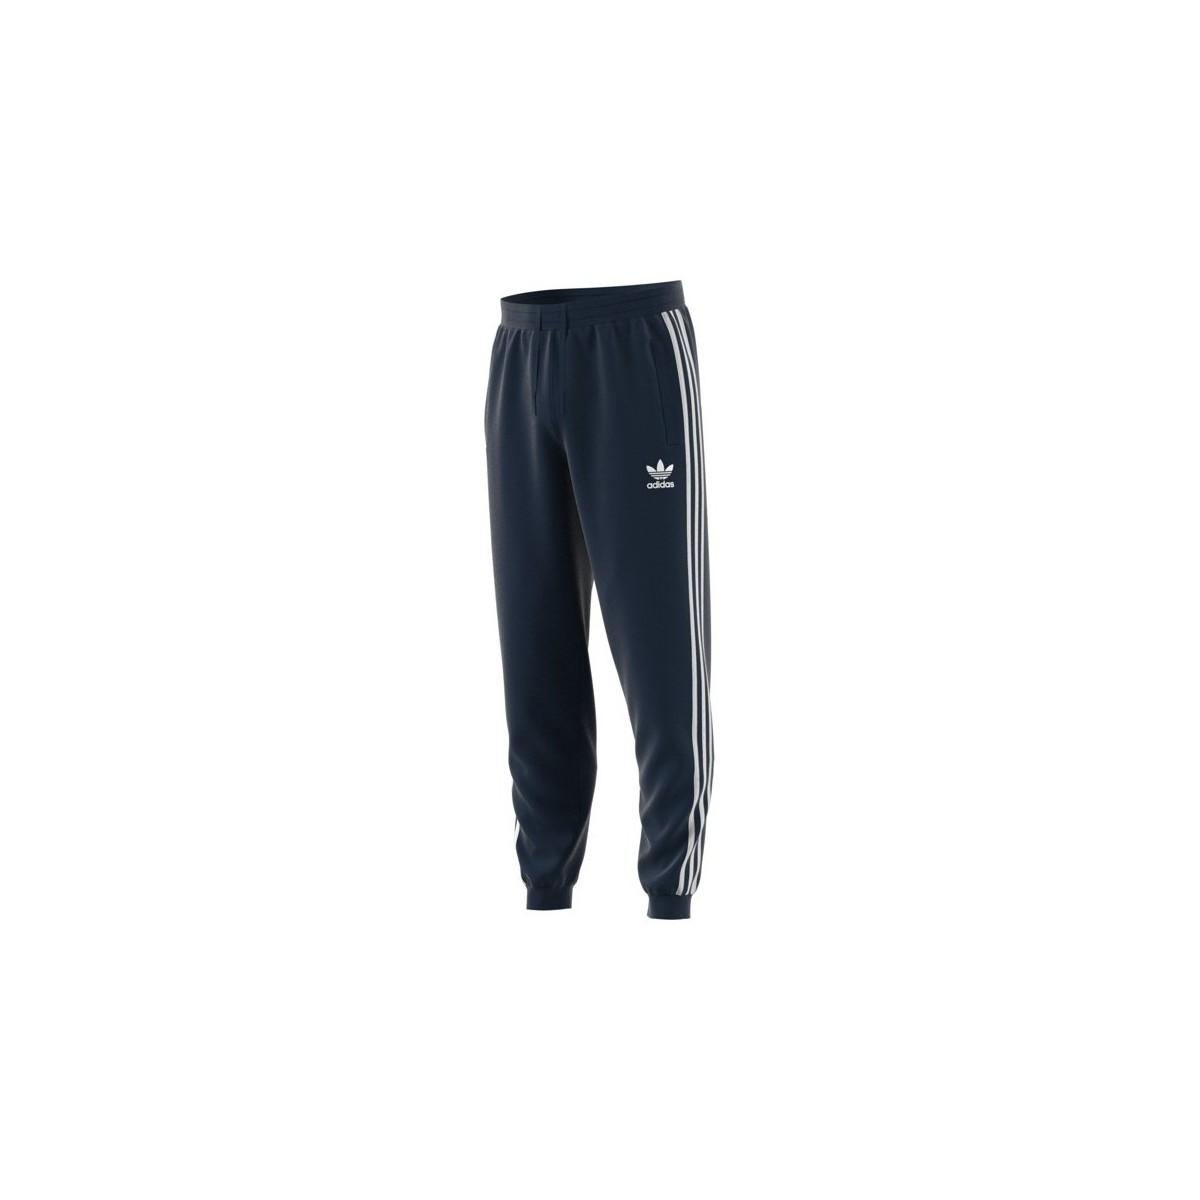 3 Stripes Jogging Adidas Pants 35RjL4Aq